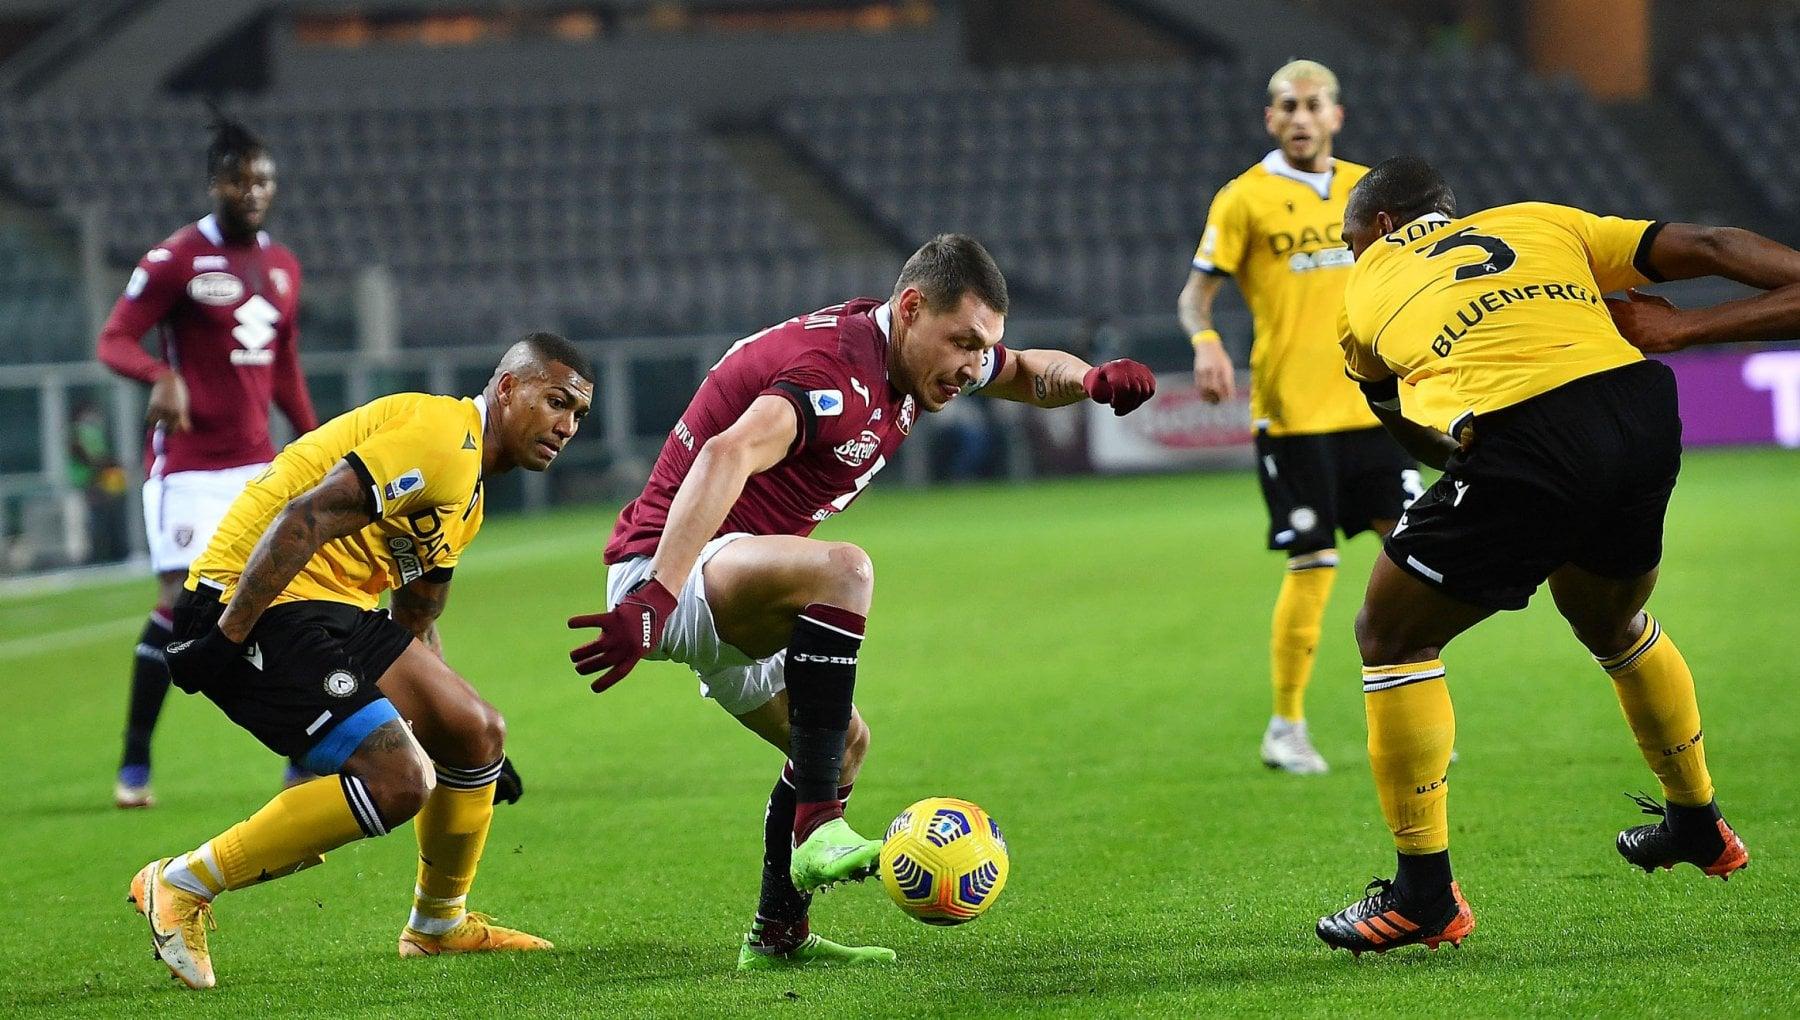 Torino Udinese 2 3 Nestorovski affonda i granata Giampaolo sempre piu a rischio